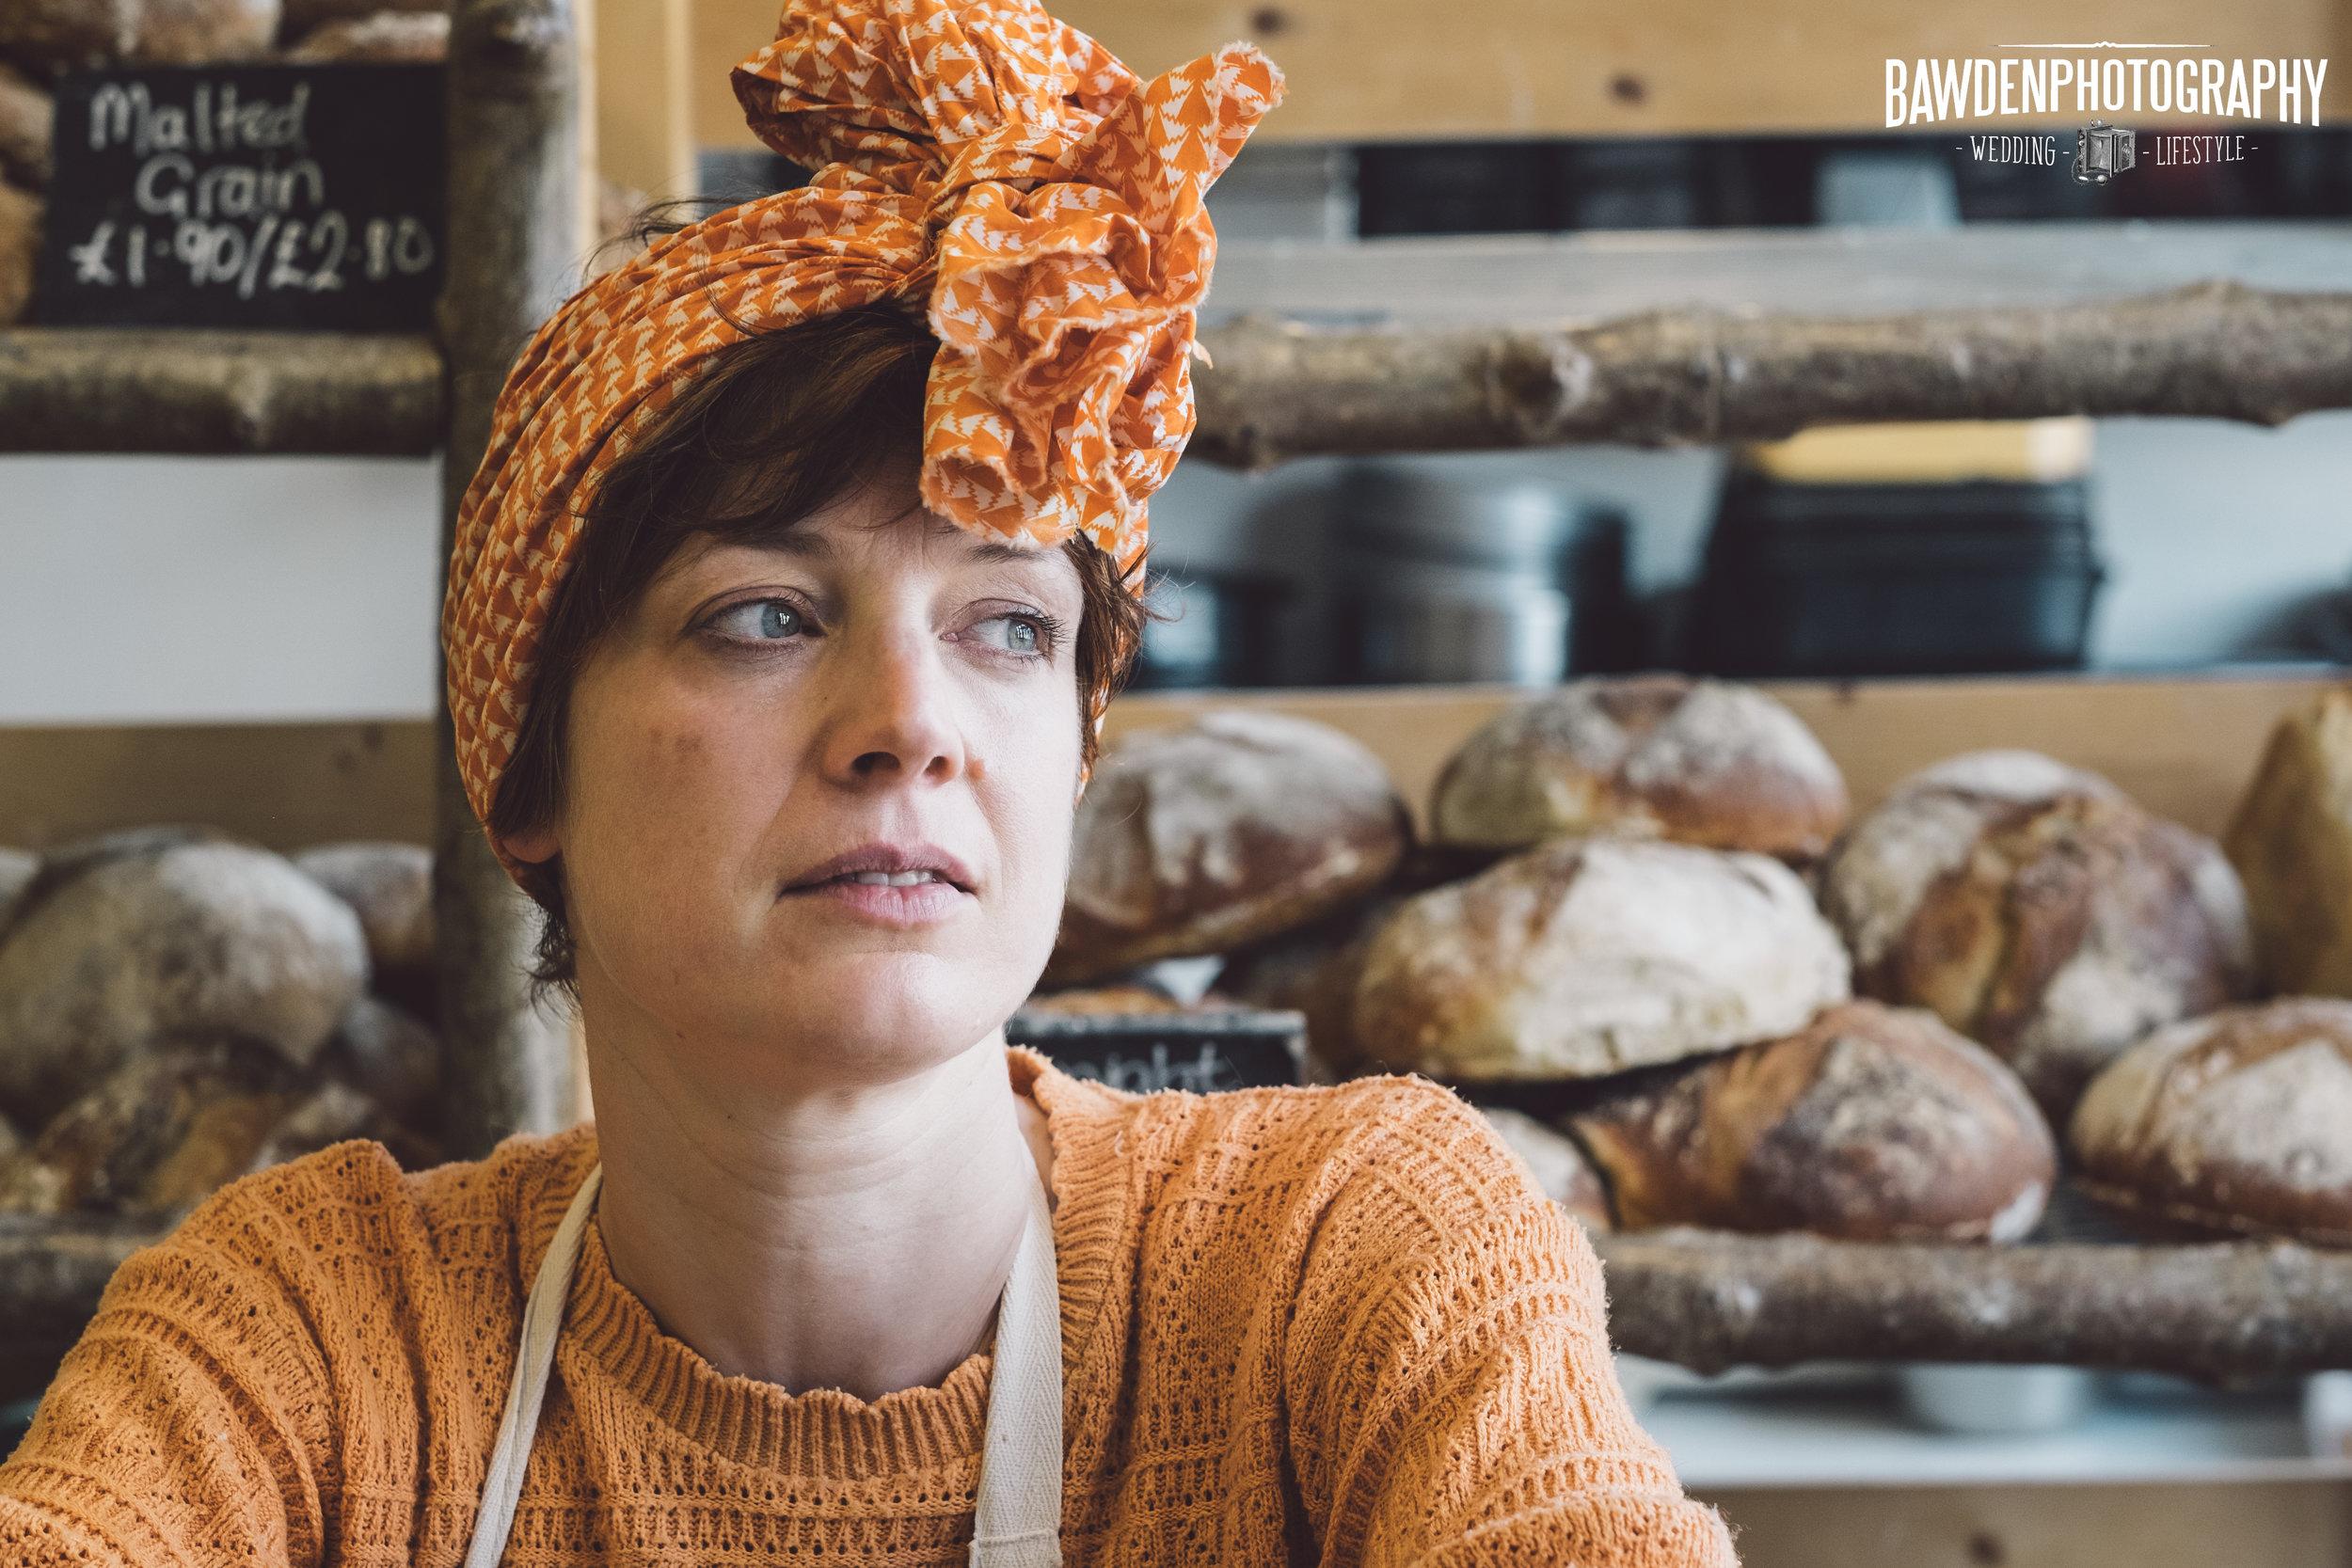 Filberts Bakery-1-6.jpg